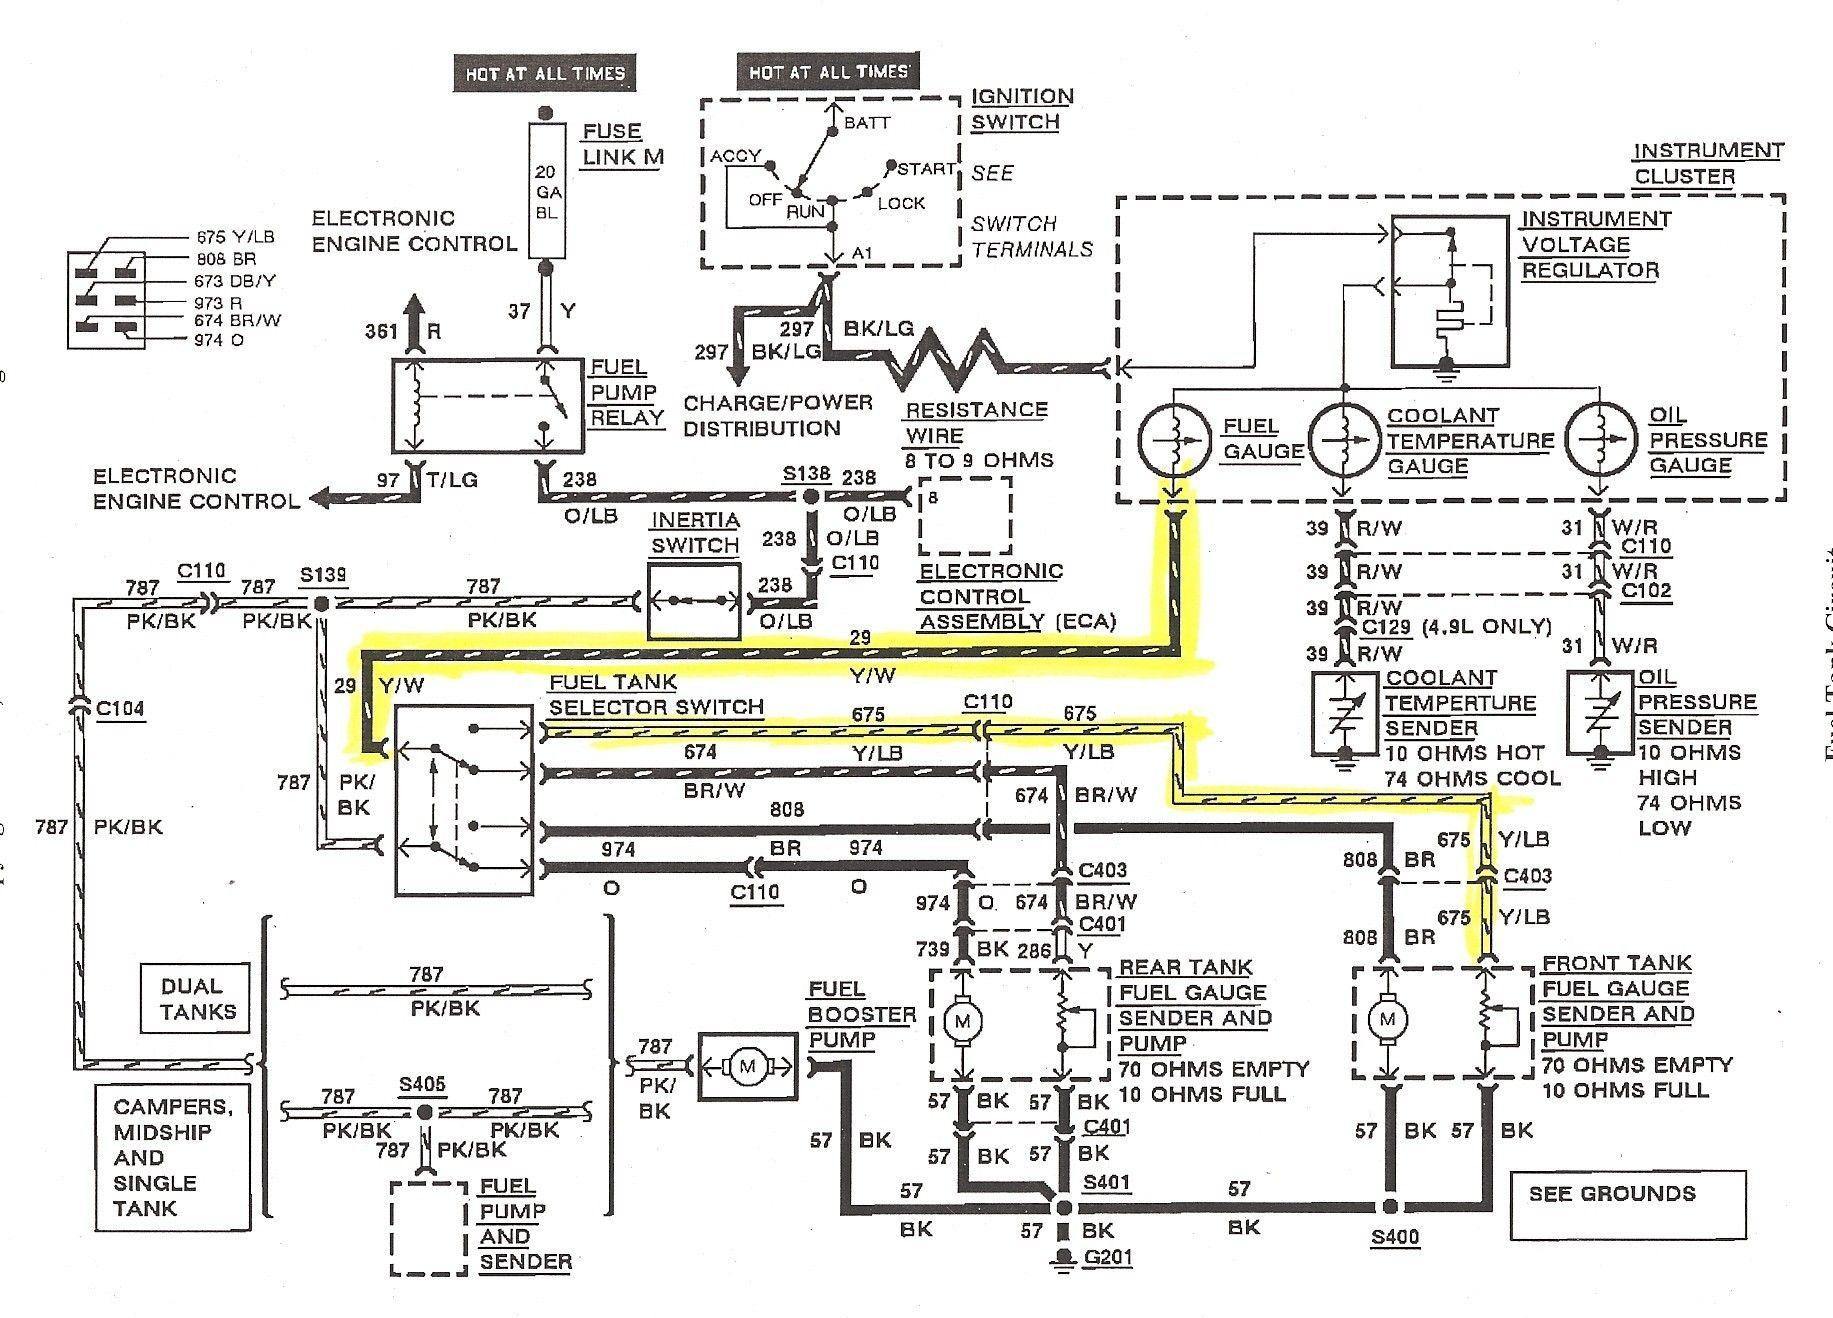 2005 Dodge Ram 3500 Trailer Wiring Diagram